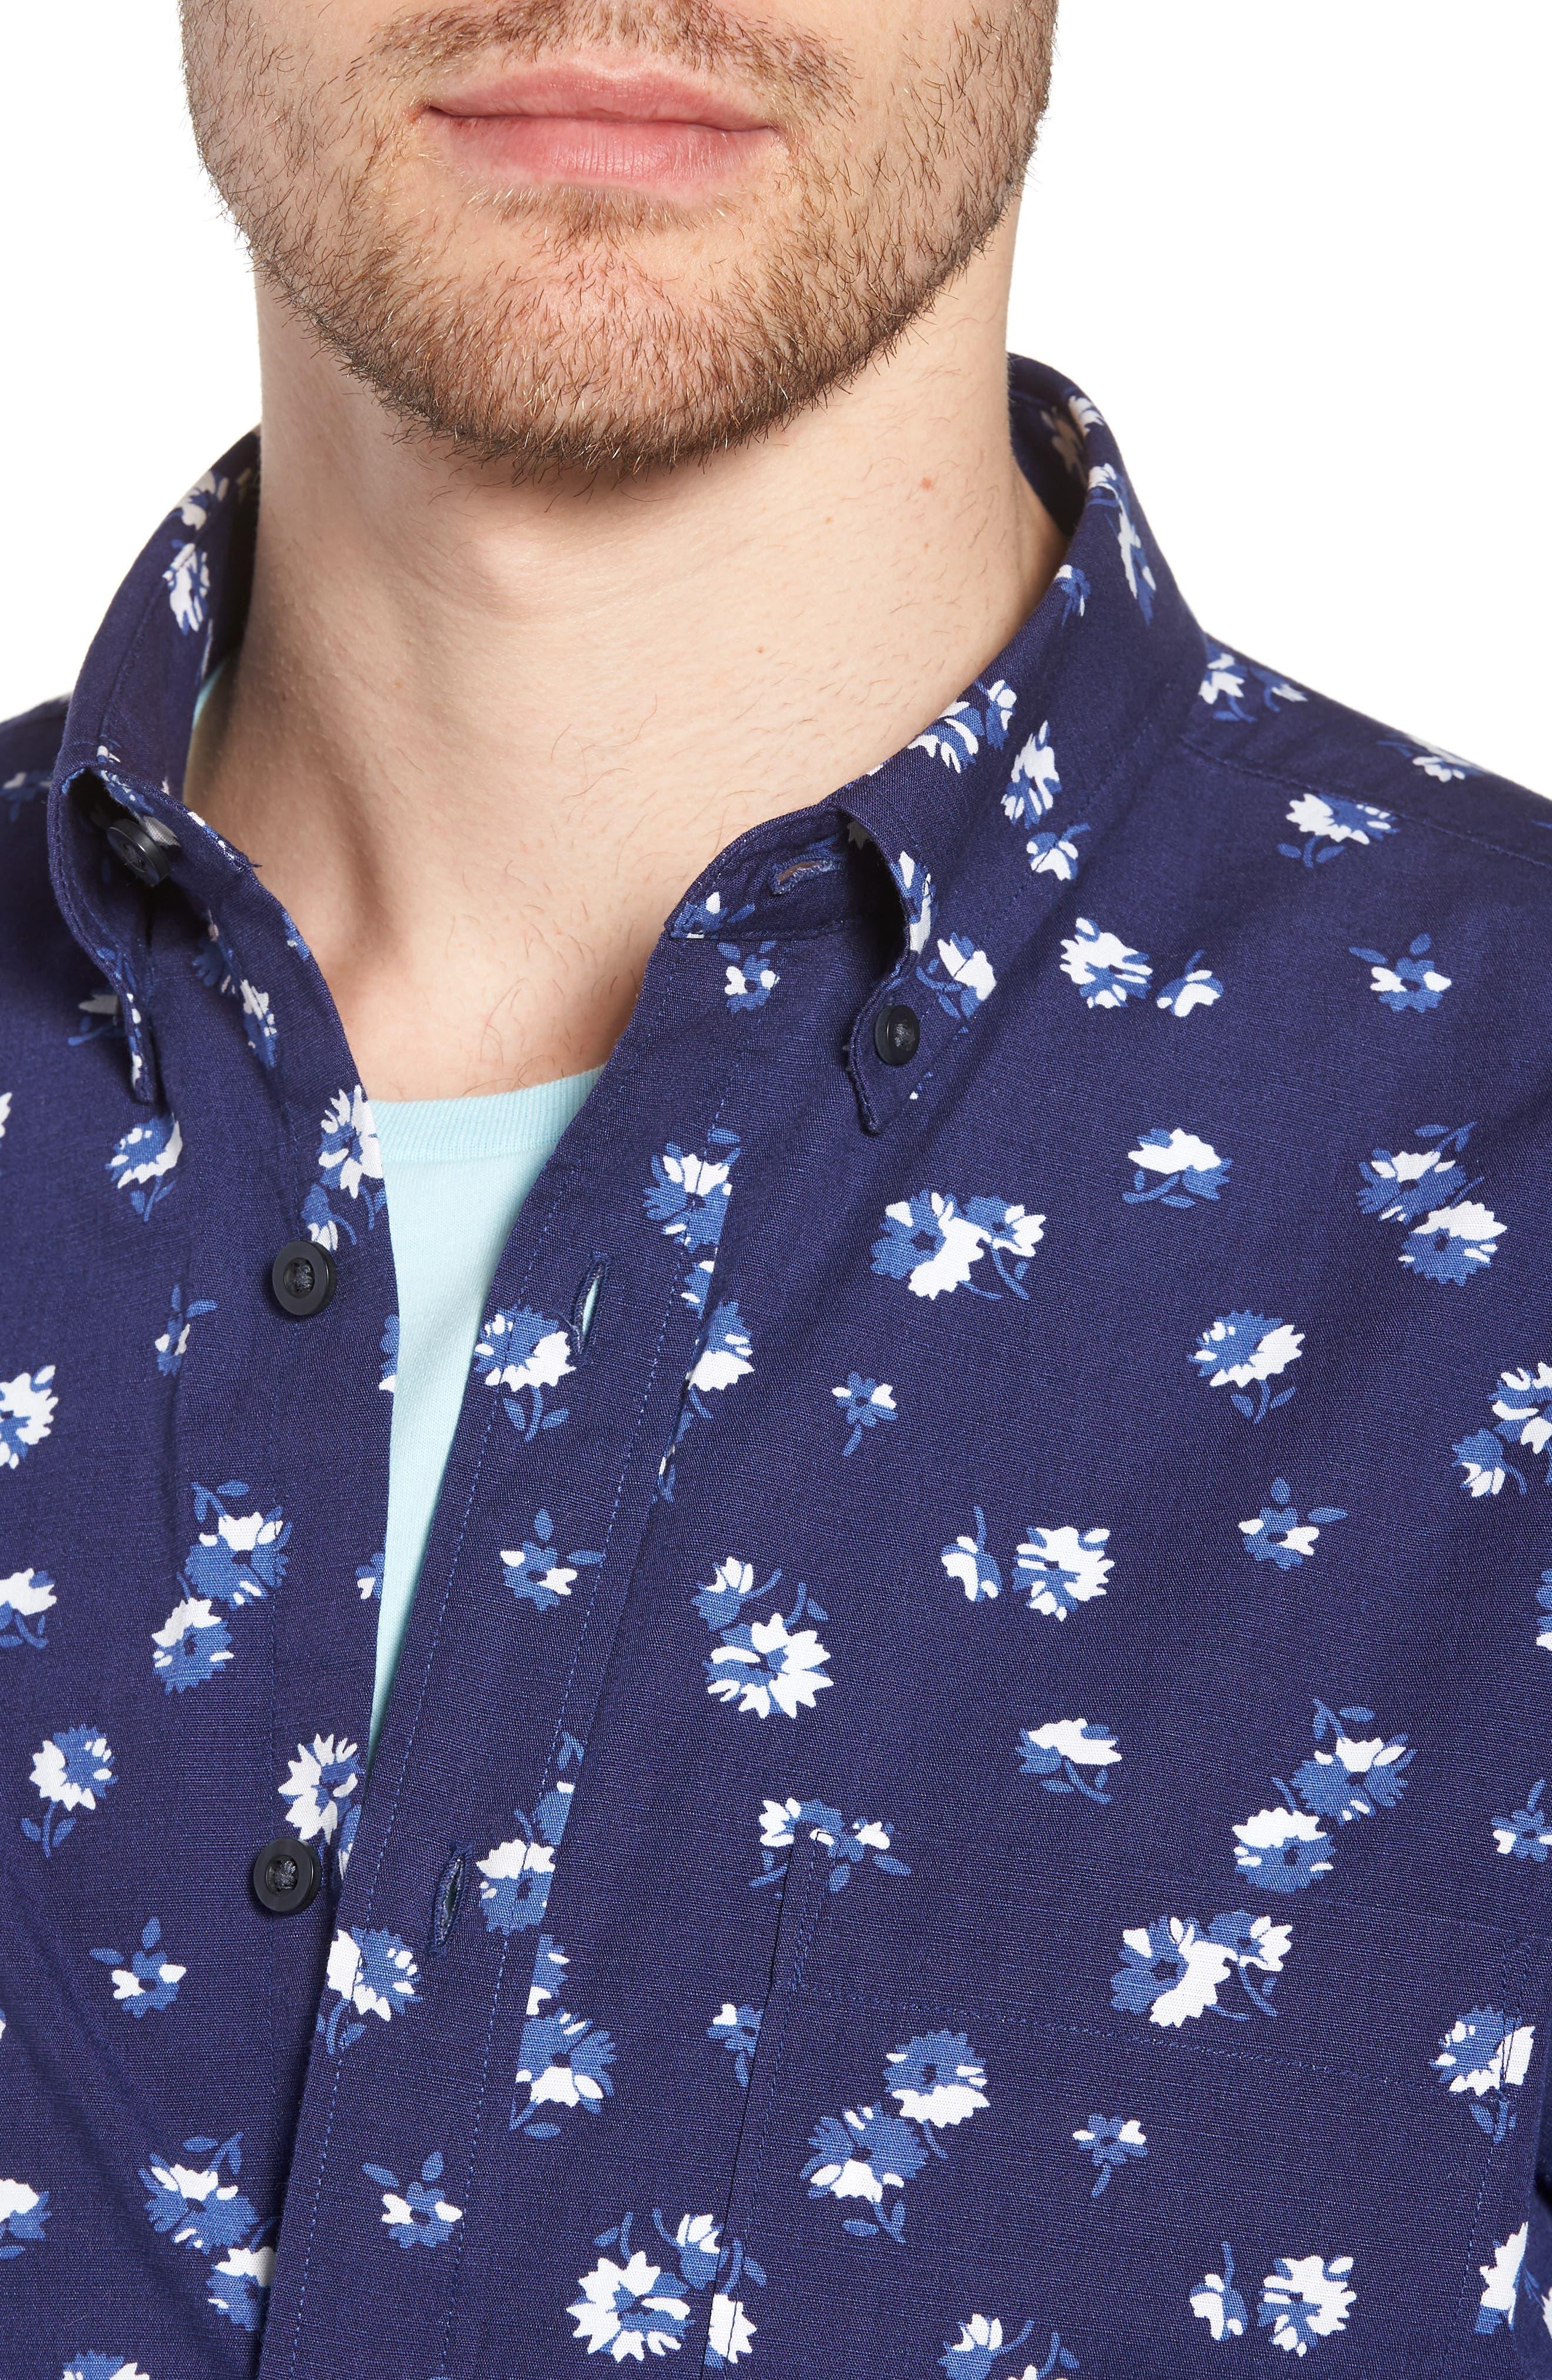 Trim Fit Floral Sport Shirt,                             Alternate thumbnail 6, color,                             Navy Iris Aster Flowers